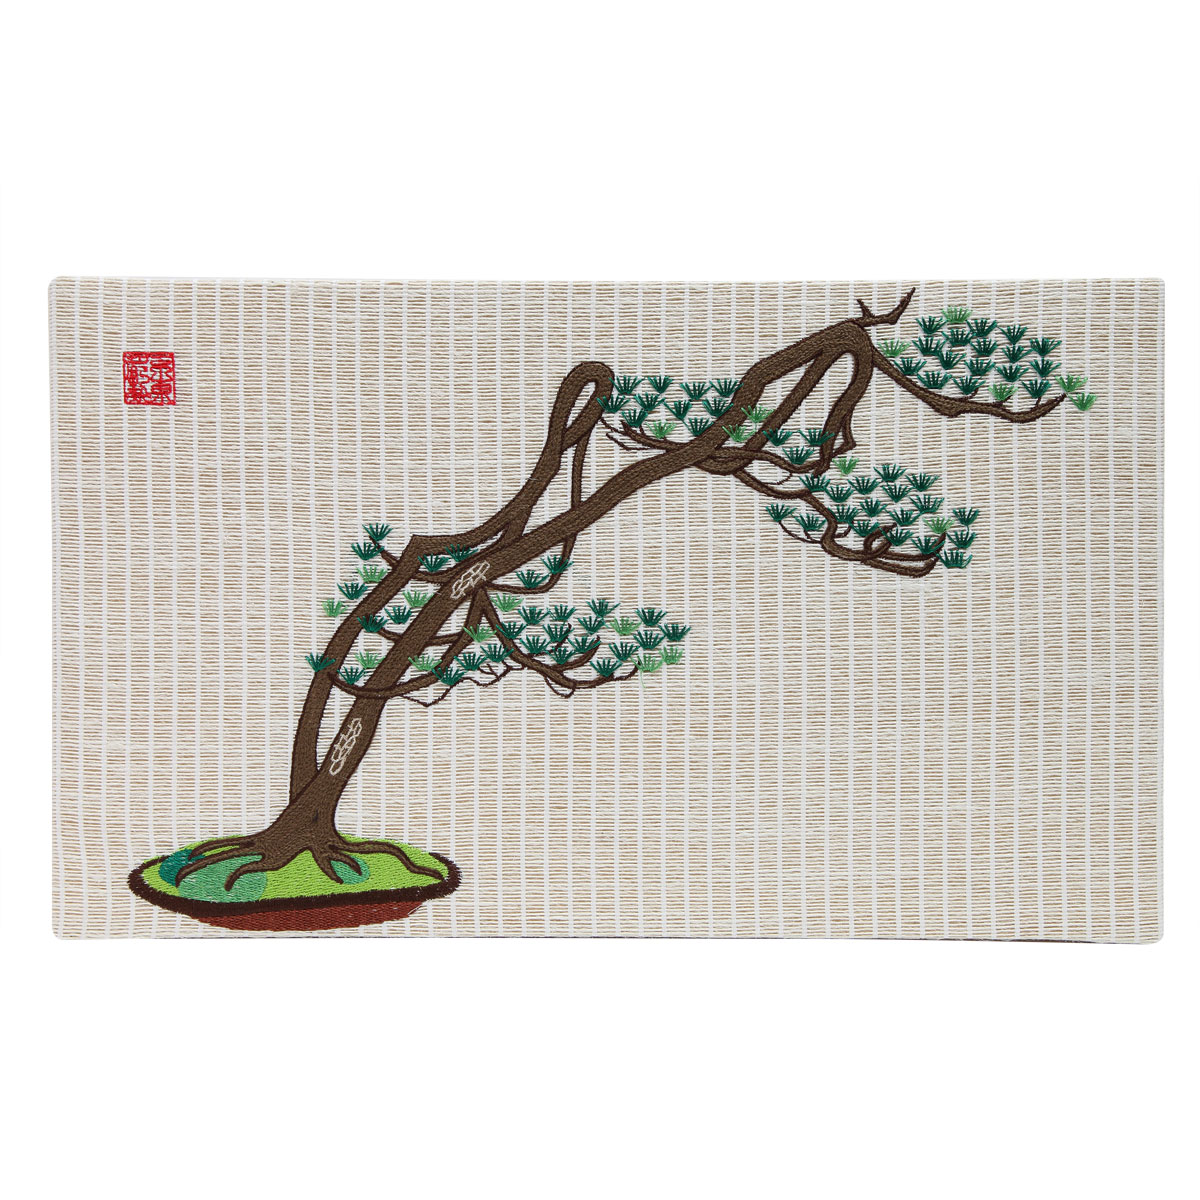 KY15-770/ファブリックパネル/赤松